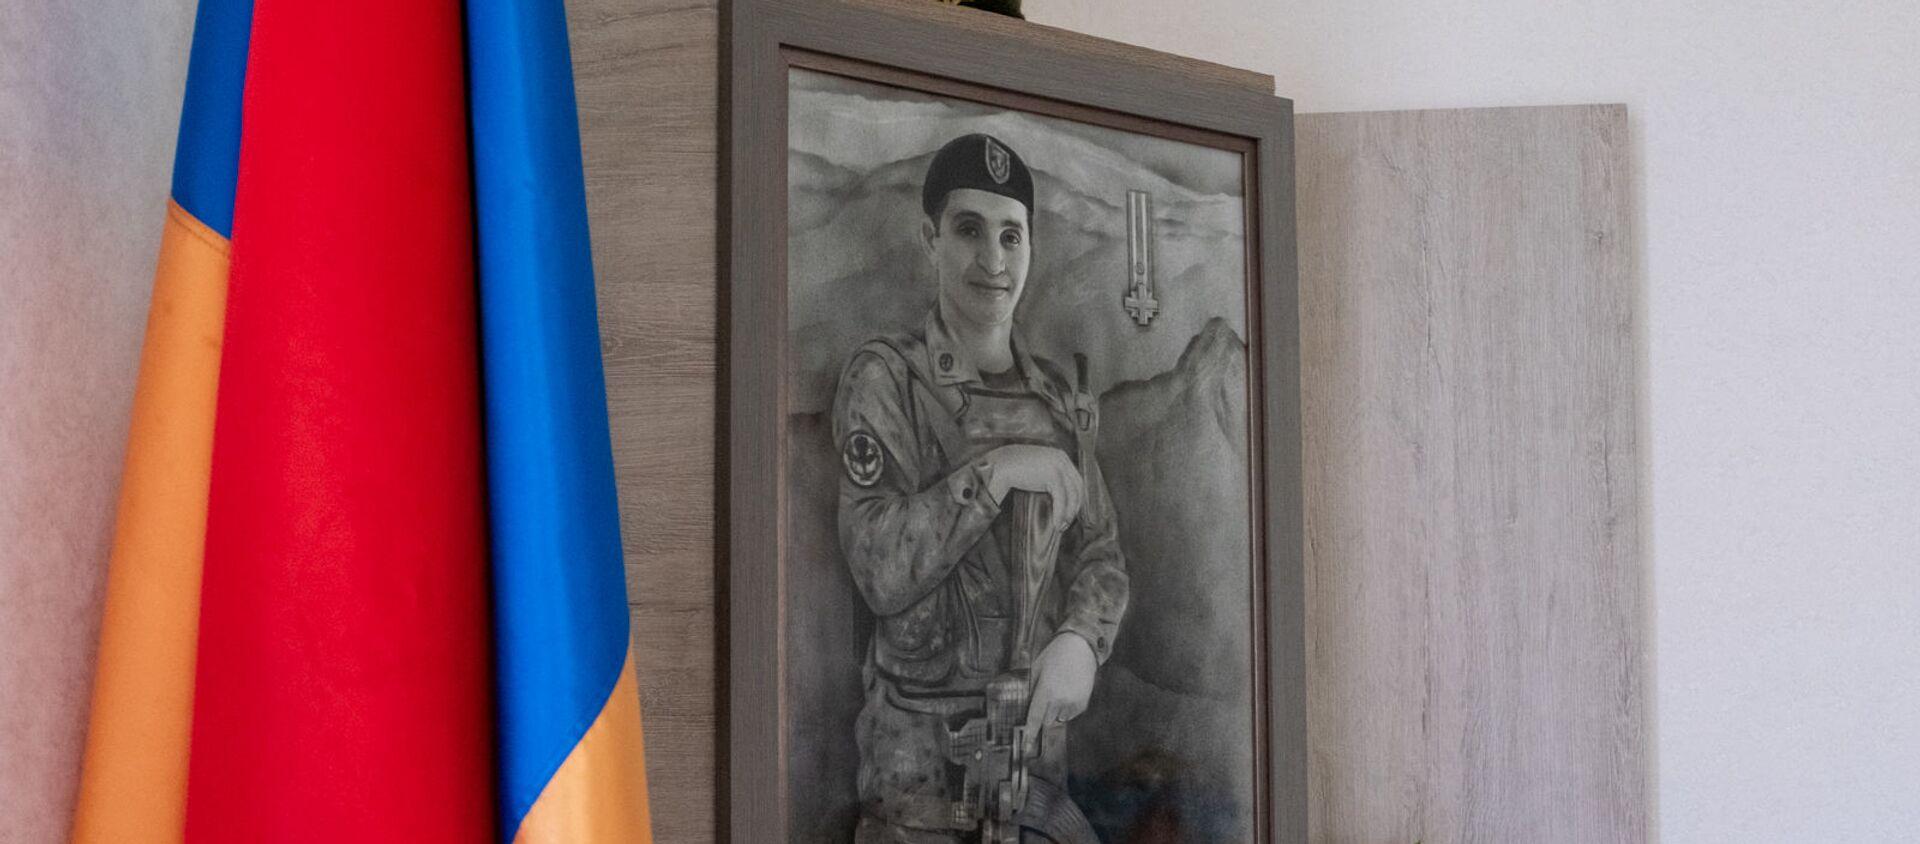 Уголок памяти погибшего капитана Ашота Микаеляна - Sputnik Արմենիա, 1920, 17.05.2021